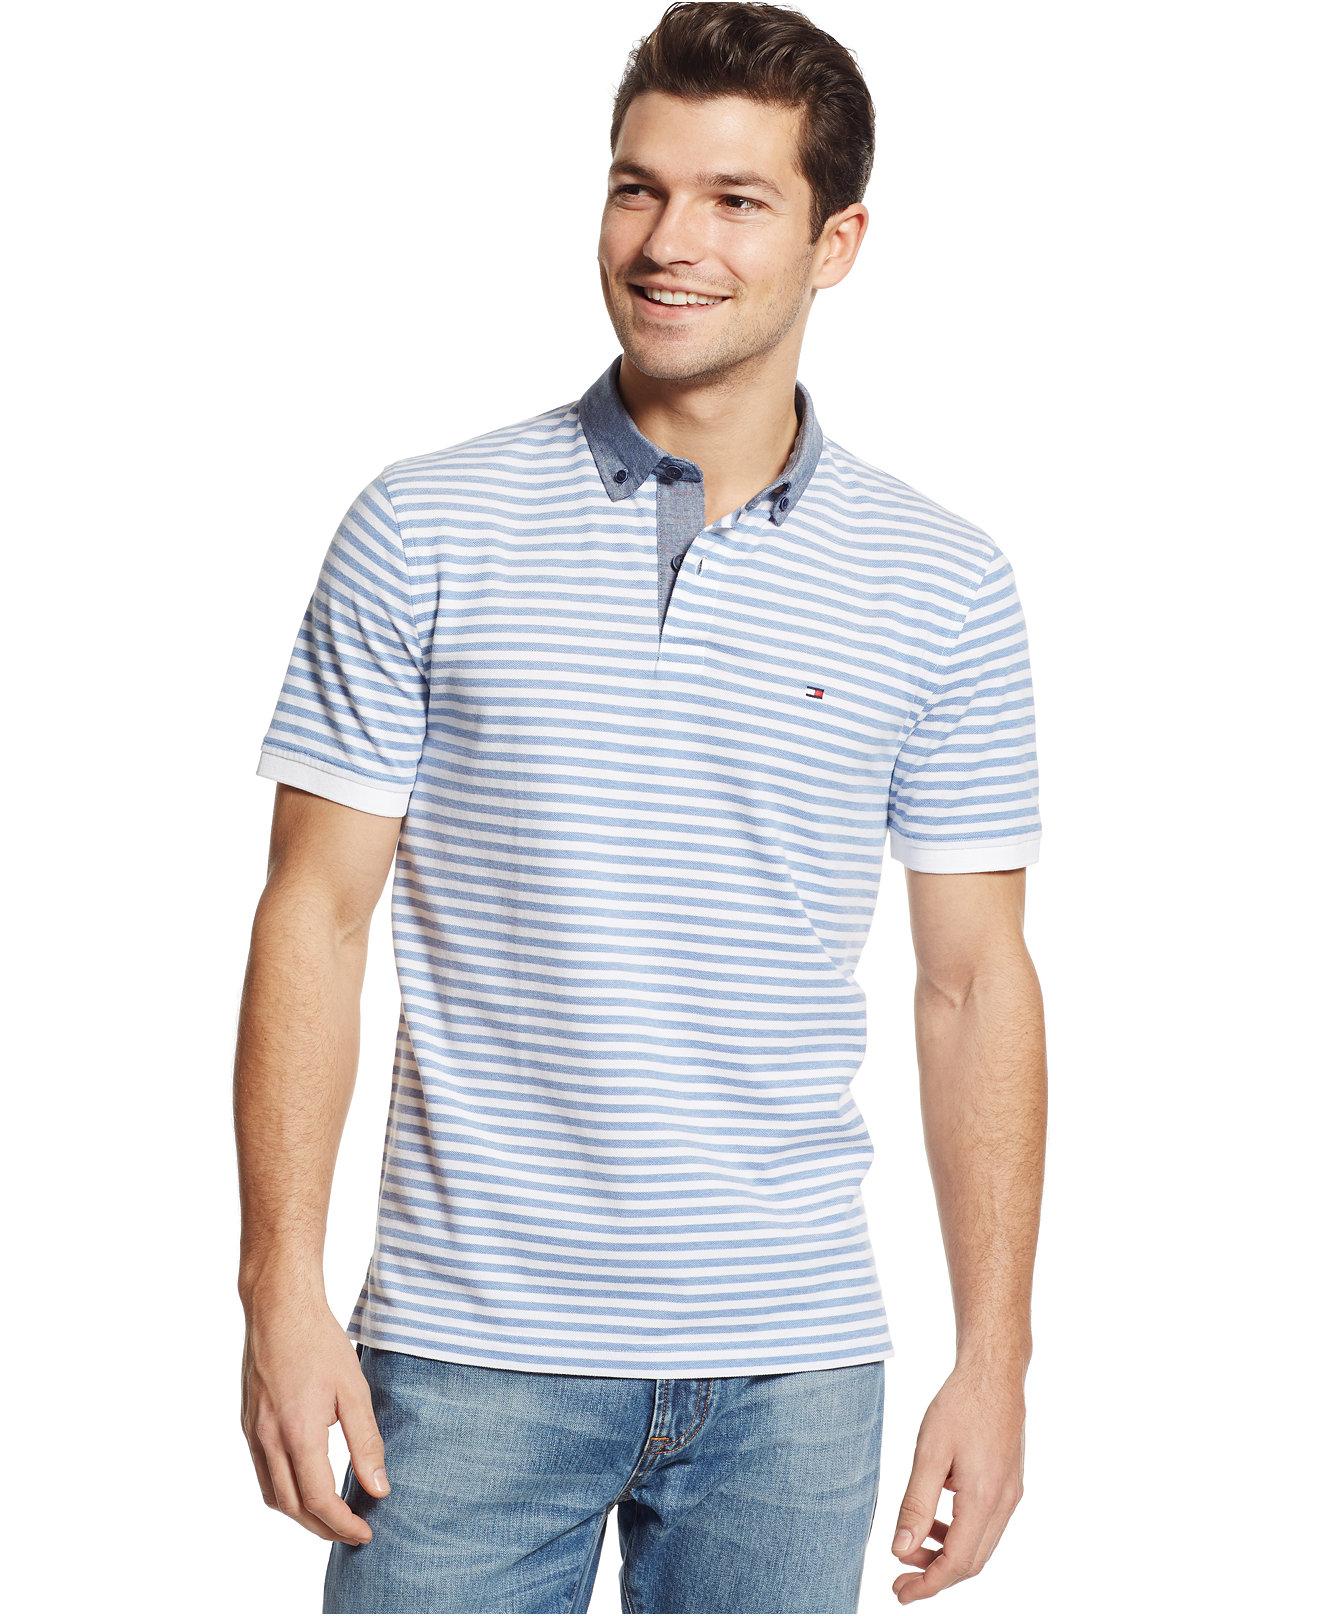 Рубашка поло Tommy hilfiger  2015 Tommy Polo футболка детская tommy hilfiger 2015 polo ml